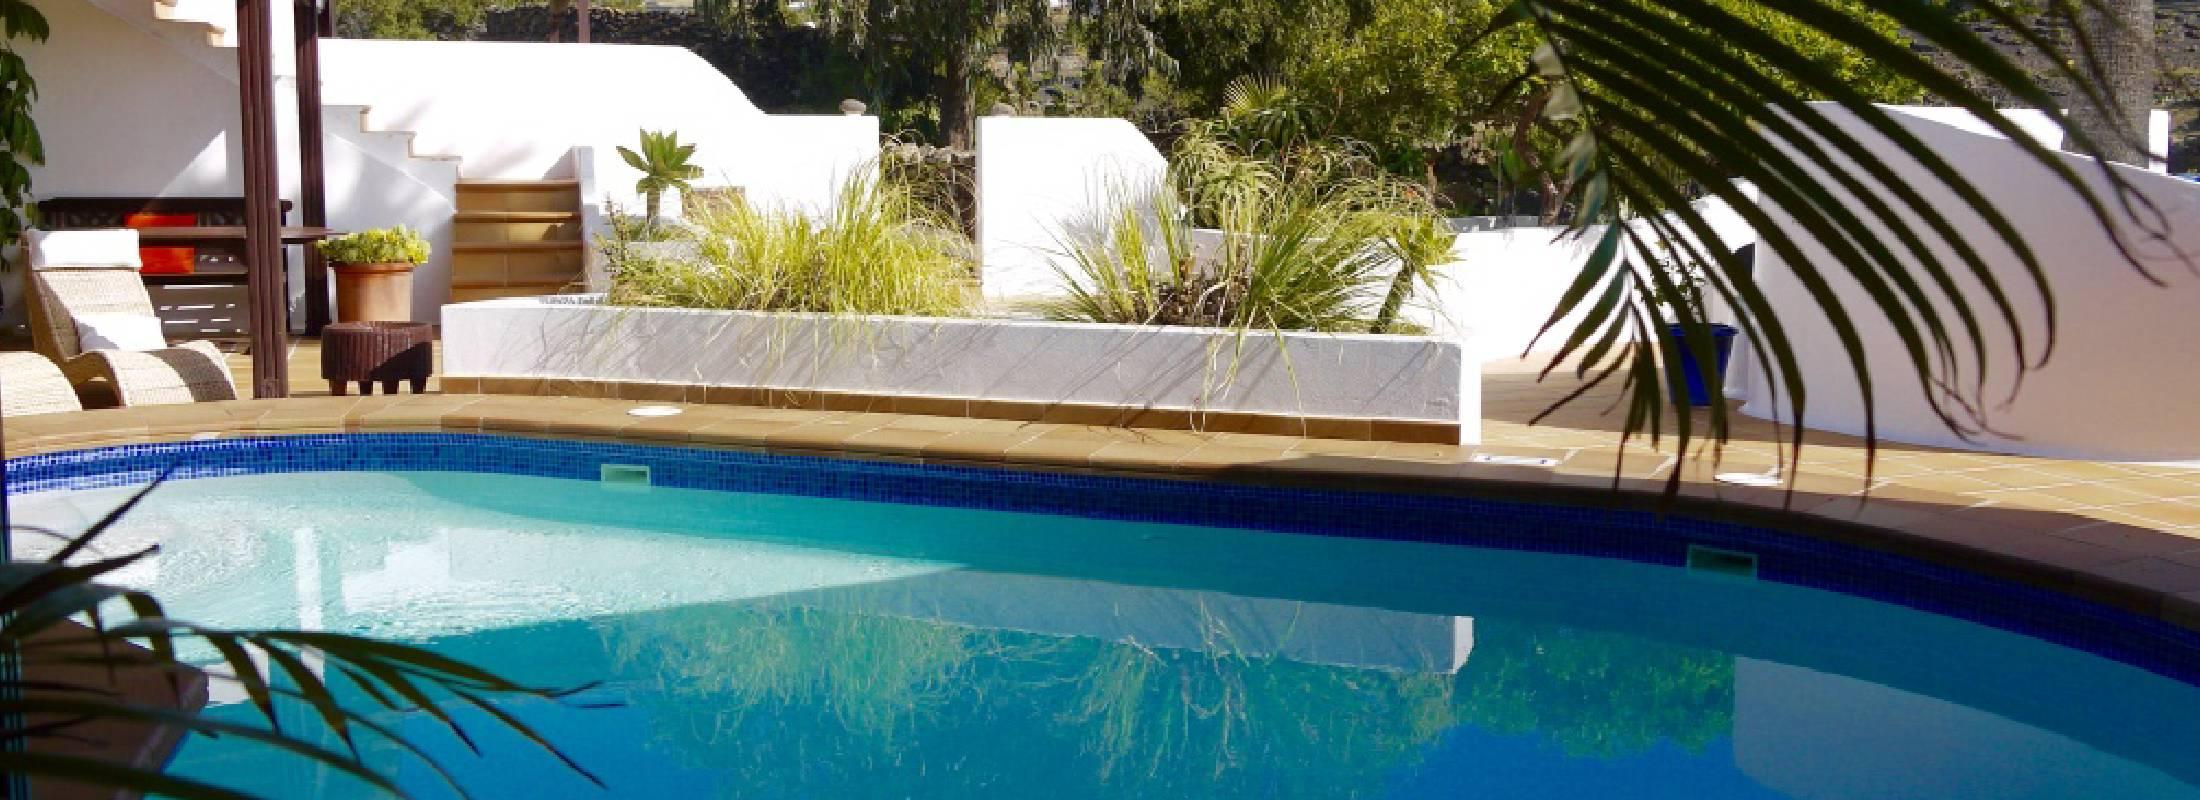 piscina en el retiro de yoga